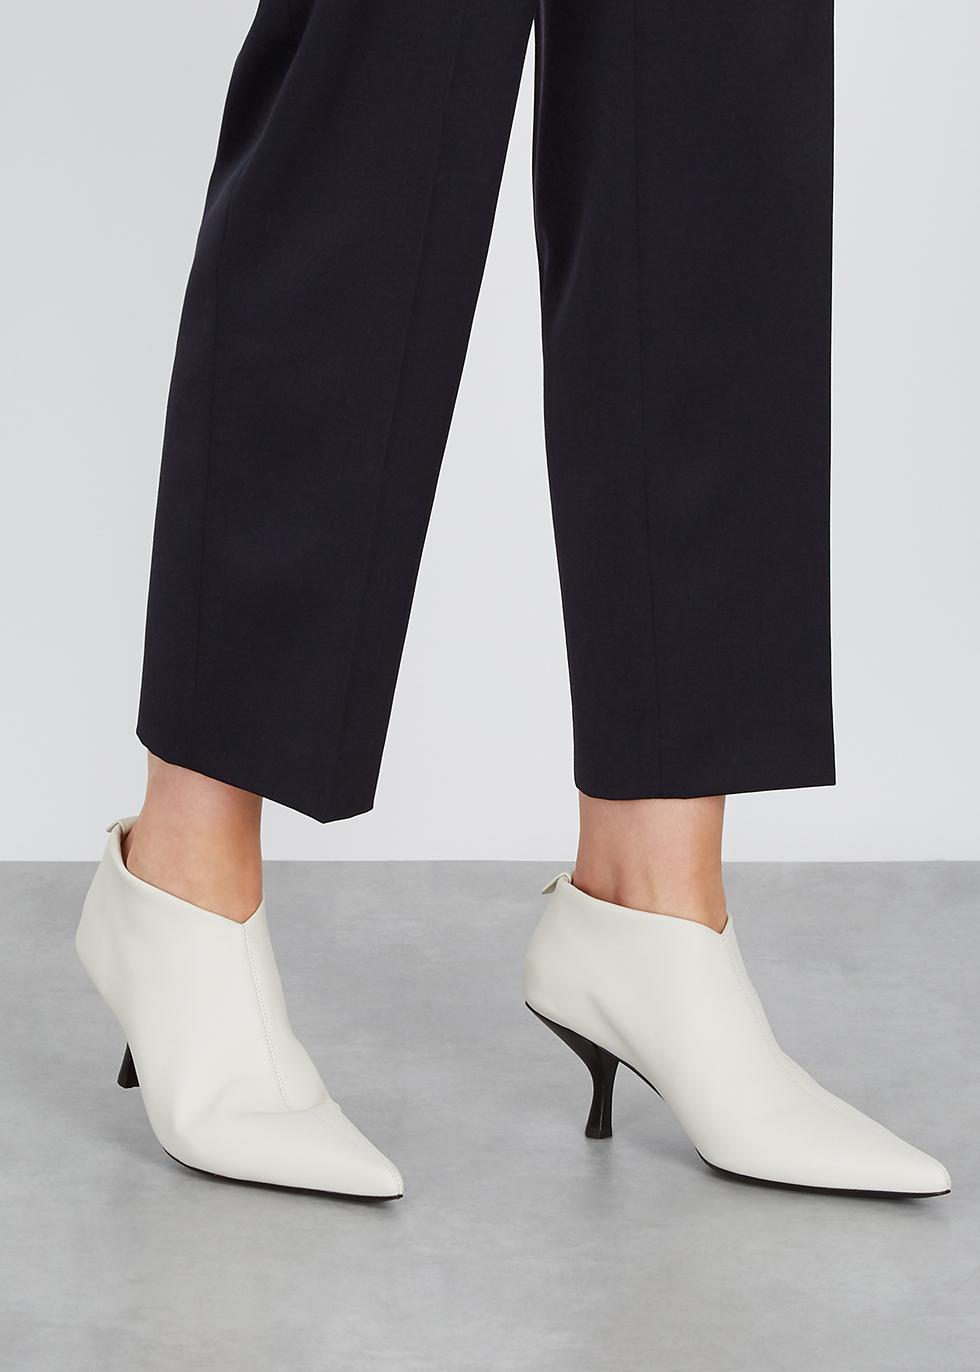 fd1f0df3bd1279 Women's Designer Clothing, Shoes and Bags - Harvey Nichols